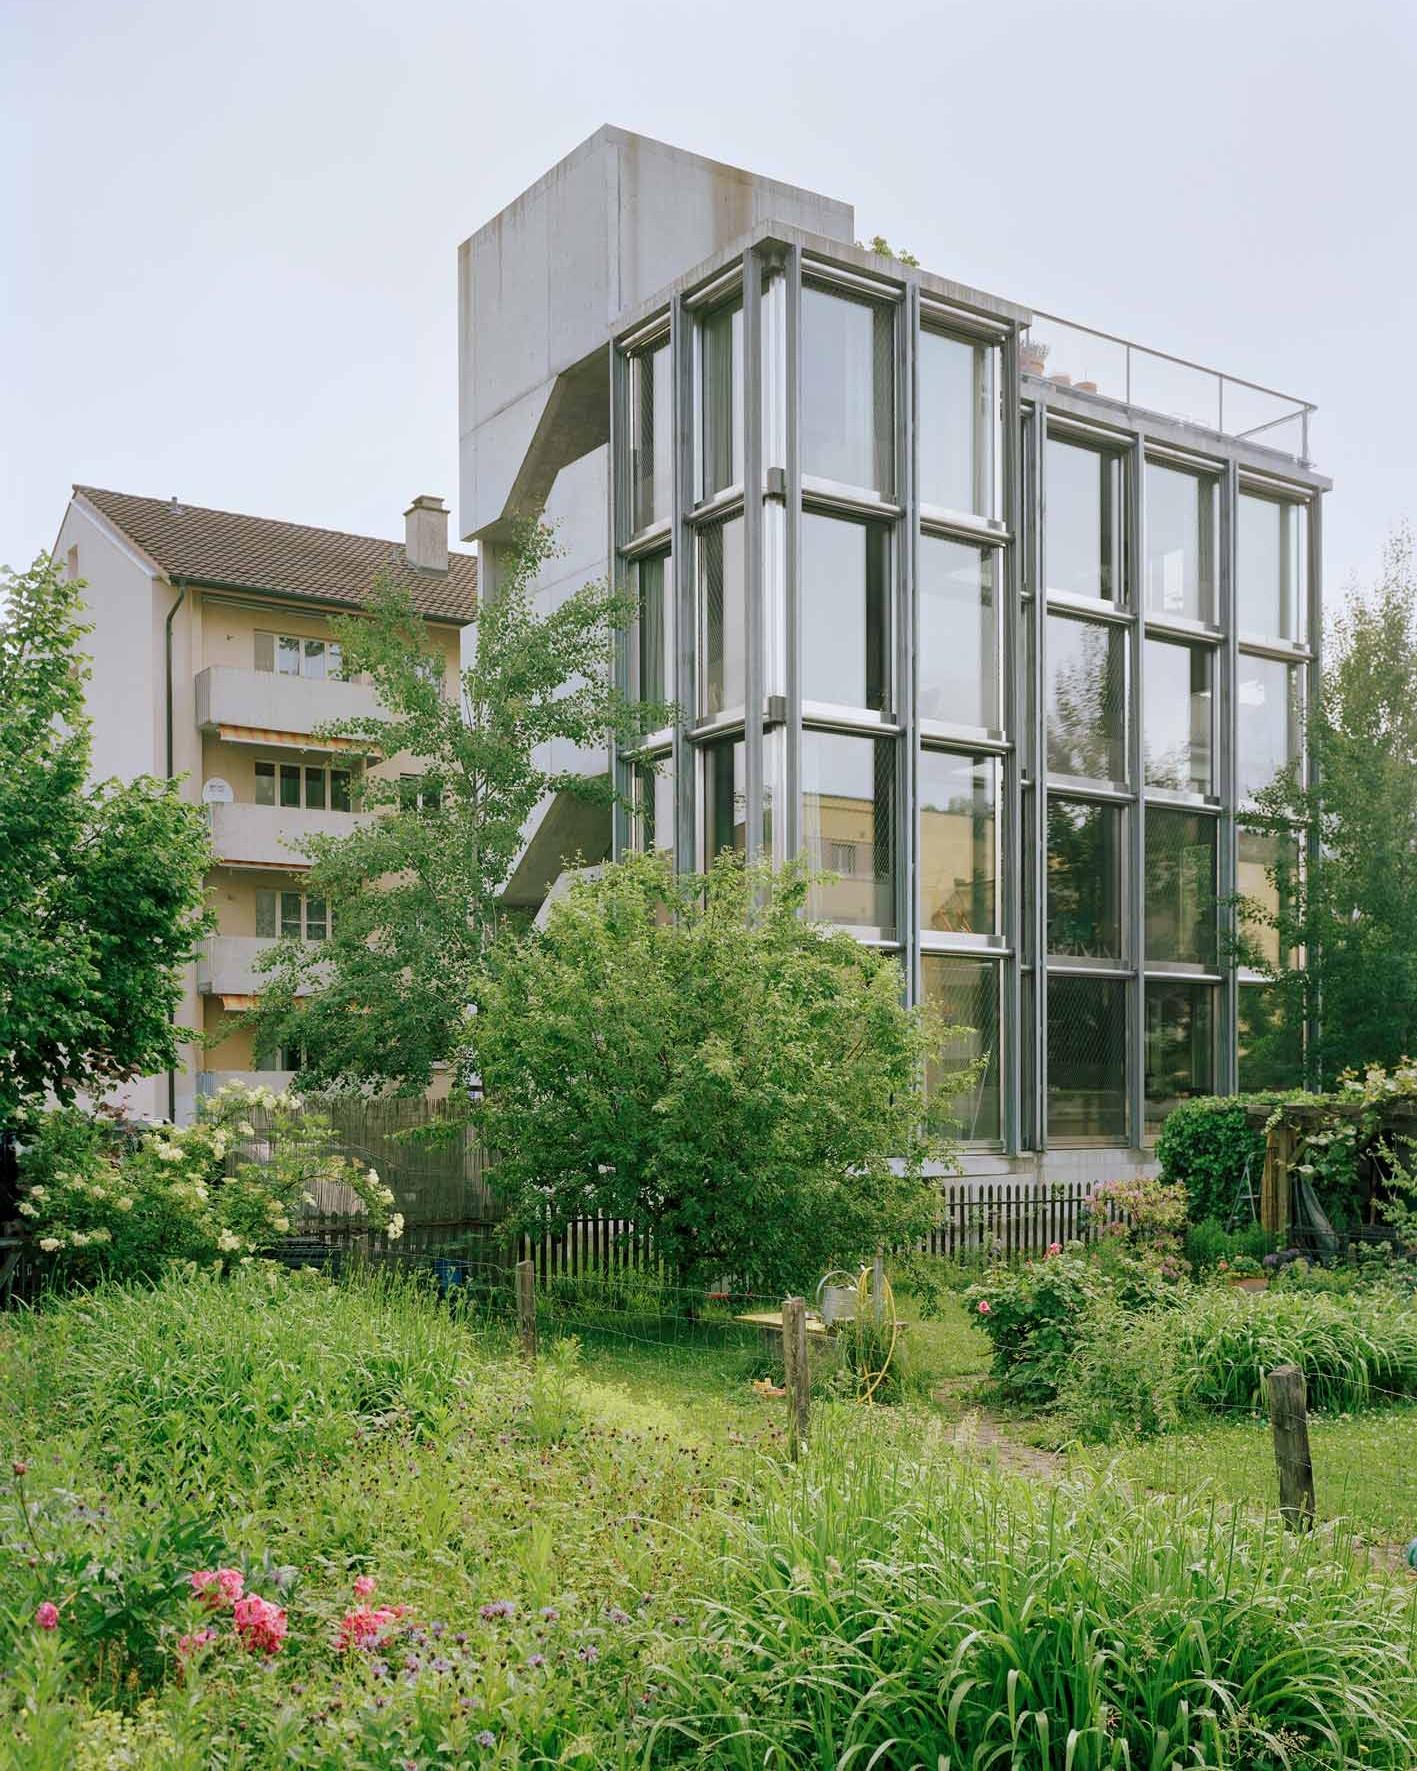 Wohnturm in Winterthur